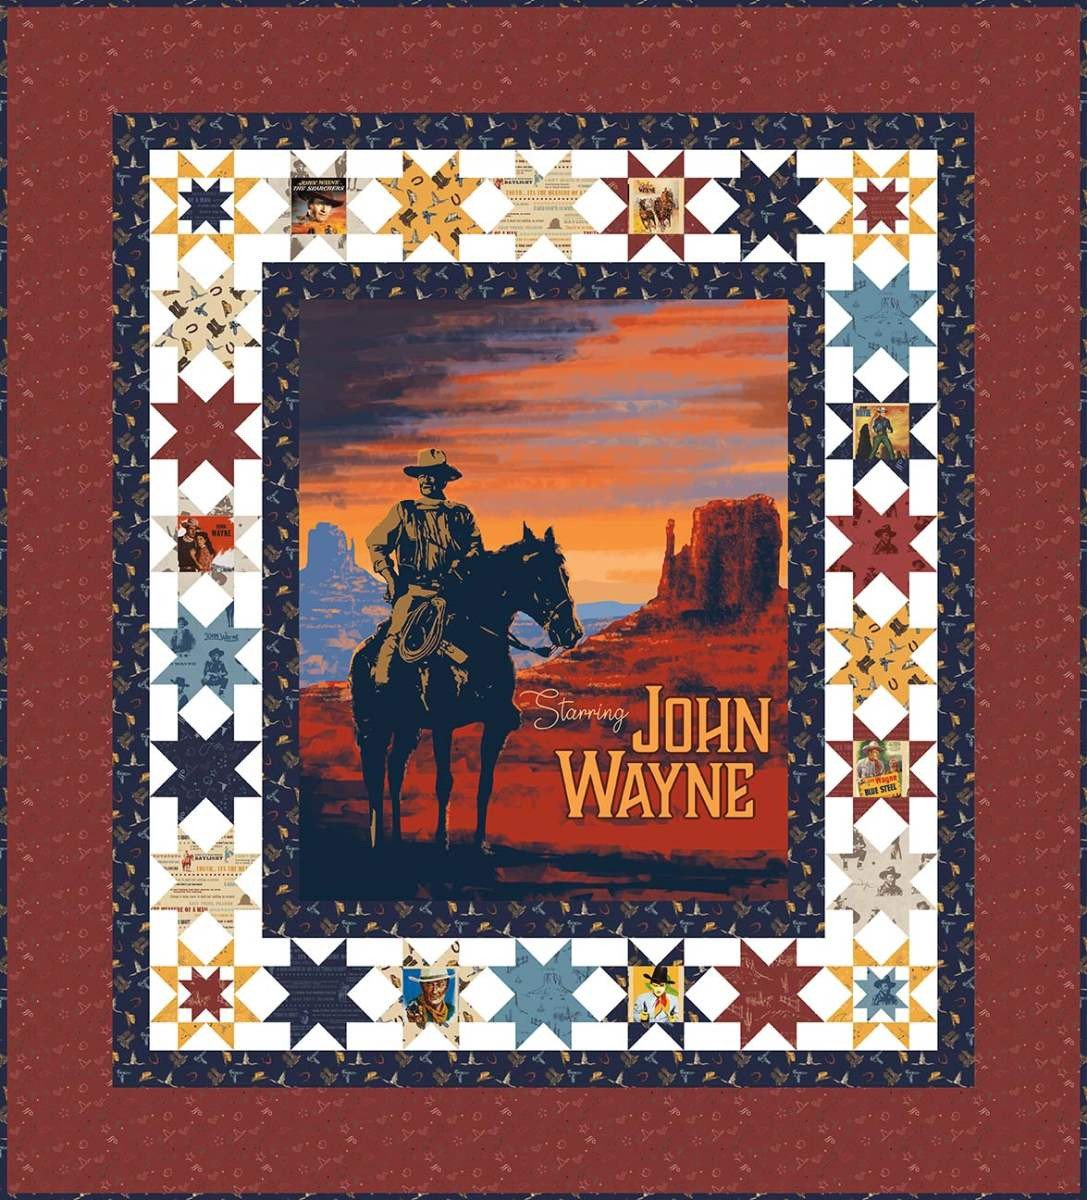 The Duke John Wayne Quilt kit 77 1/4 X 85 1/4